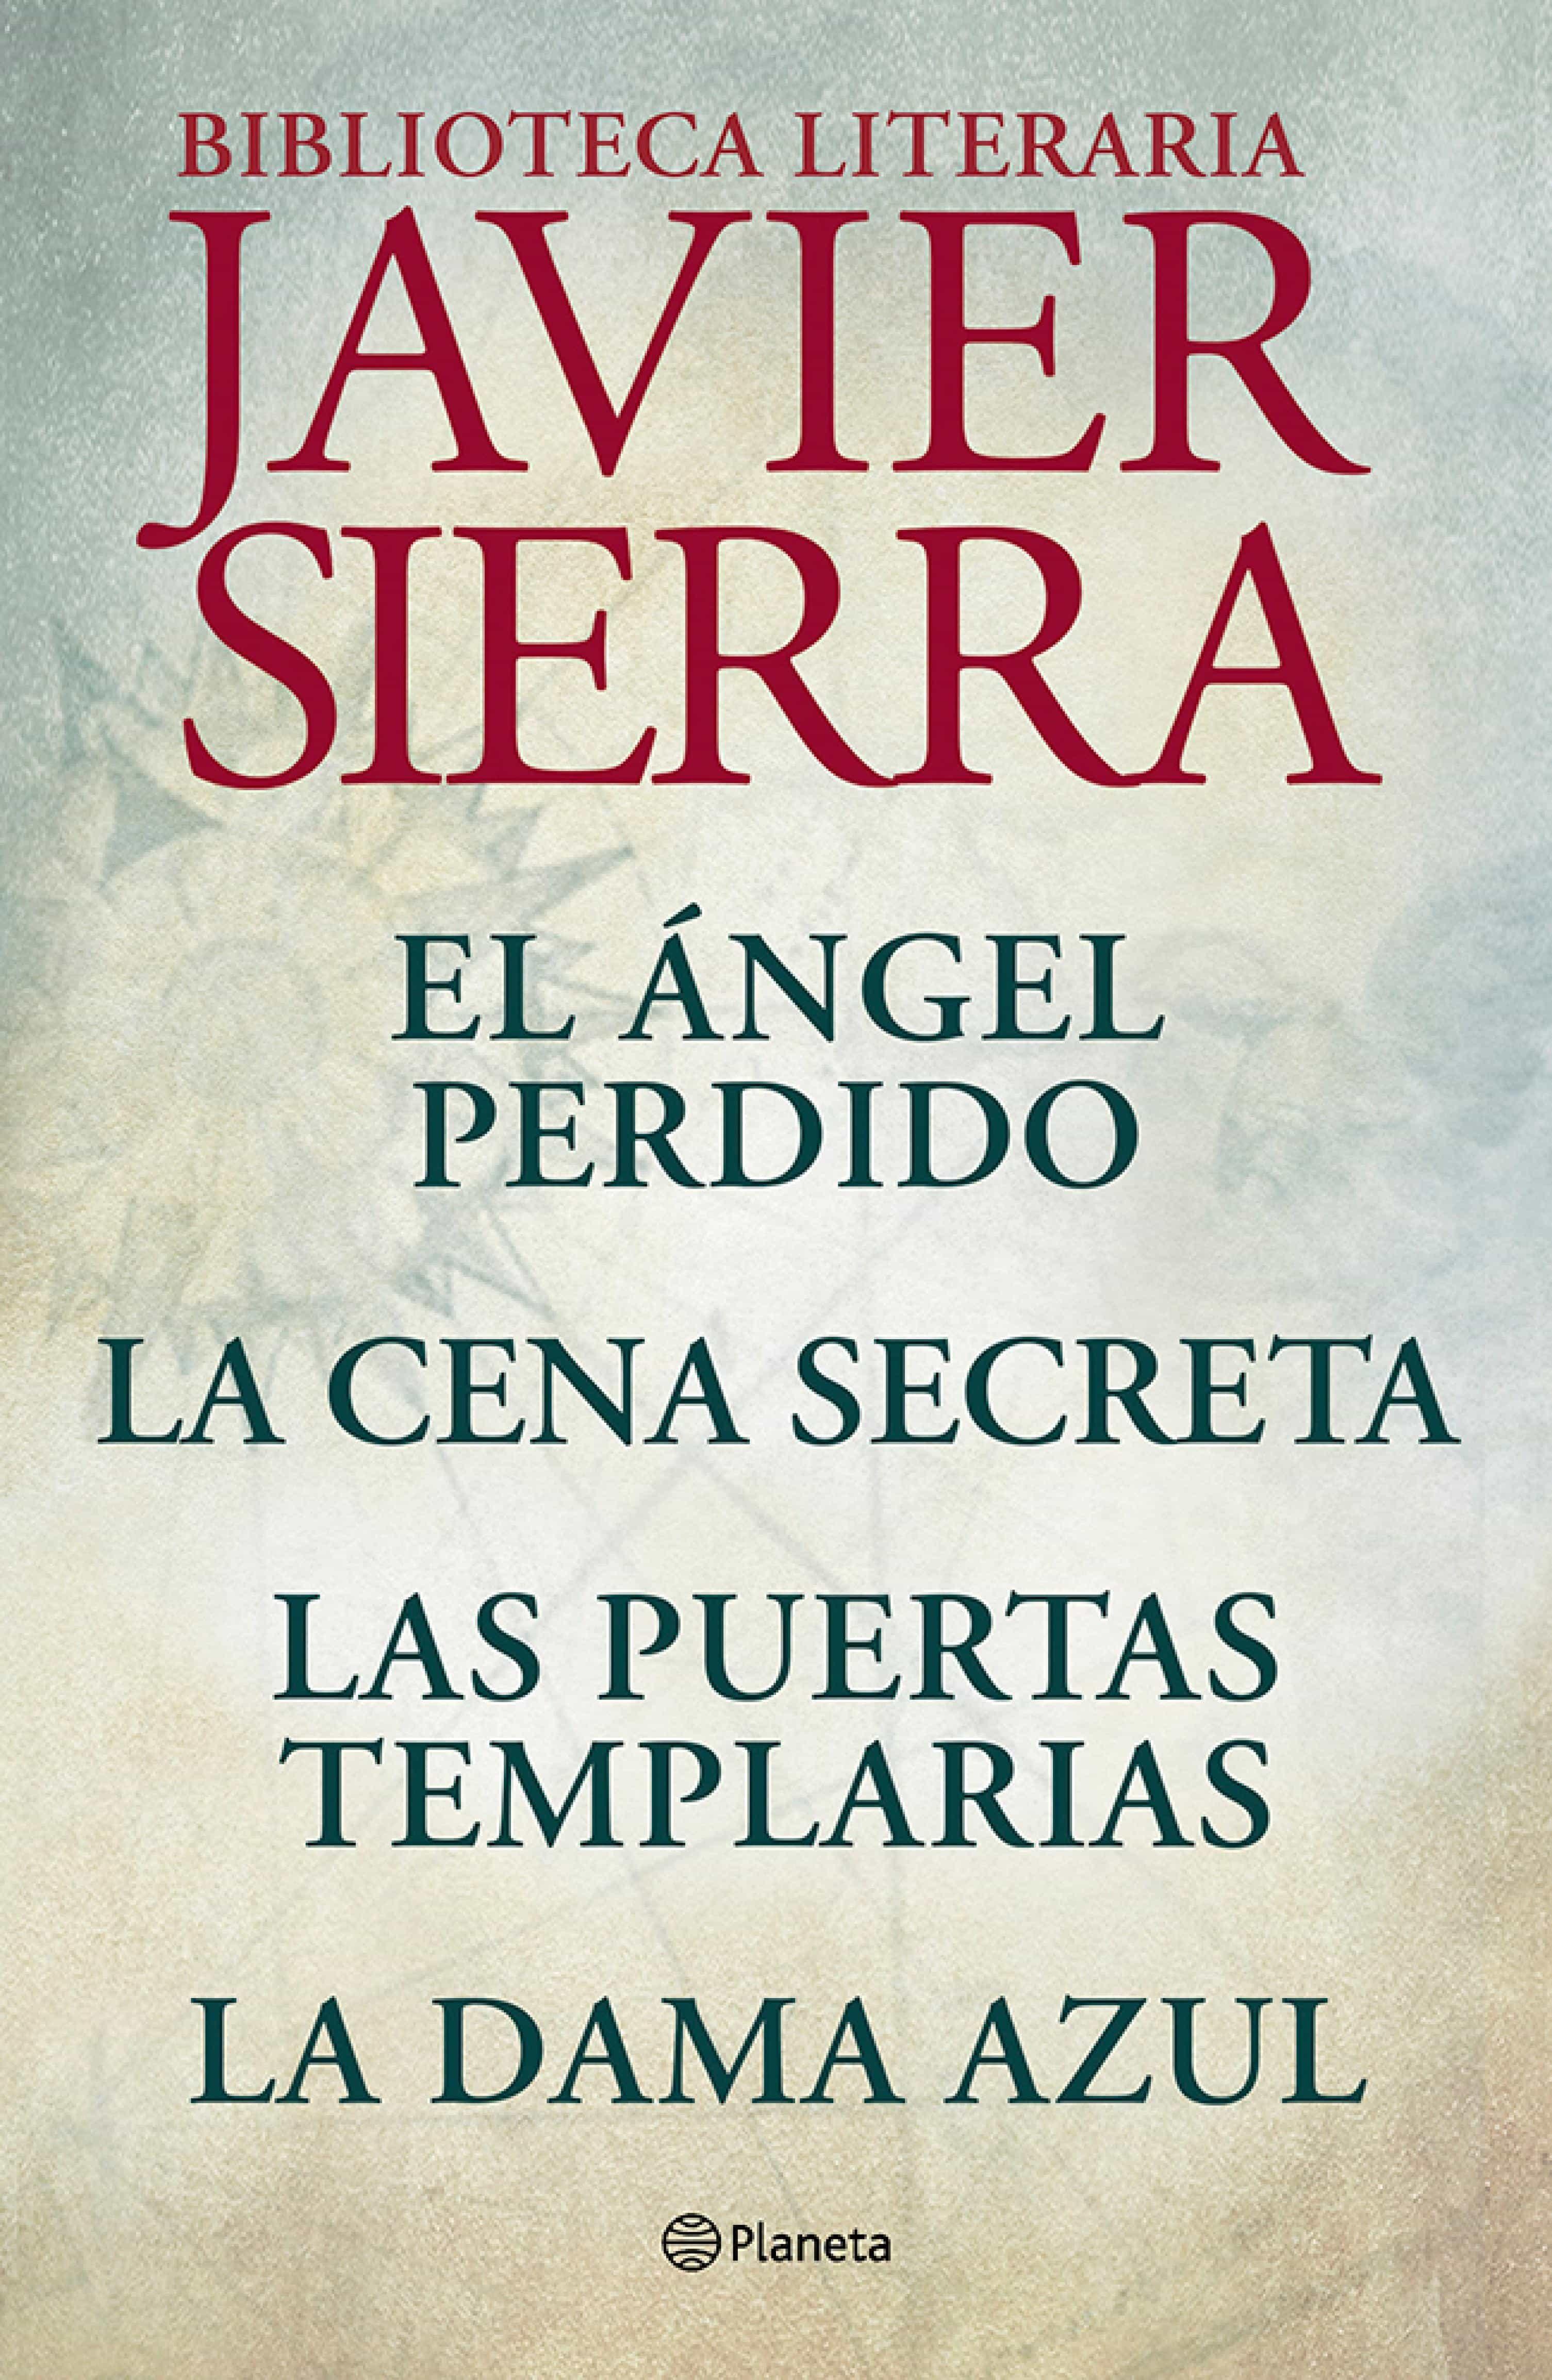 Resultado de imagen de BIBLIOTECA LITERARIA - Javier Sierra